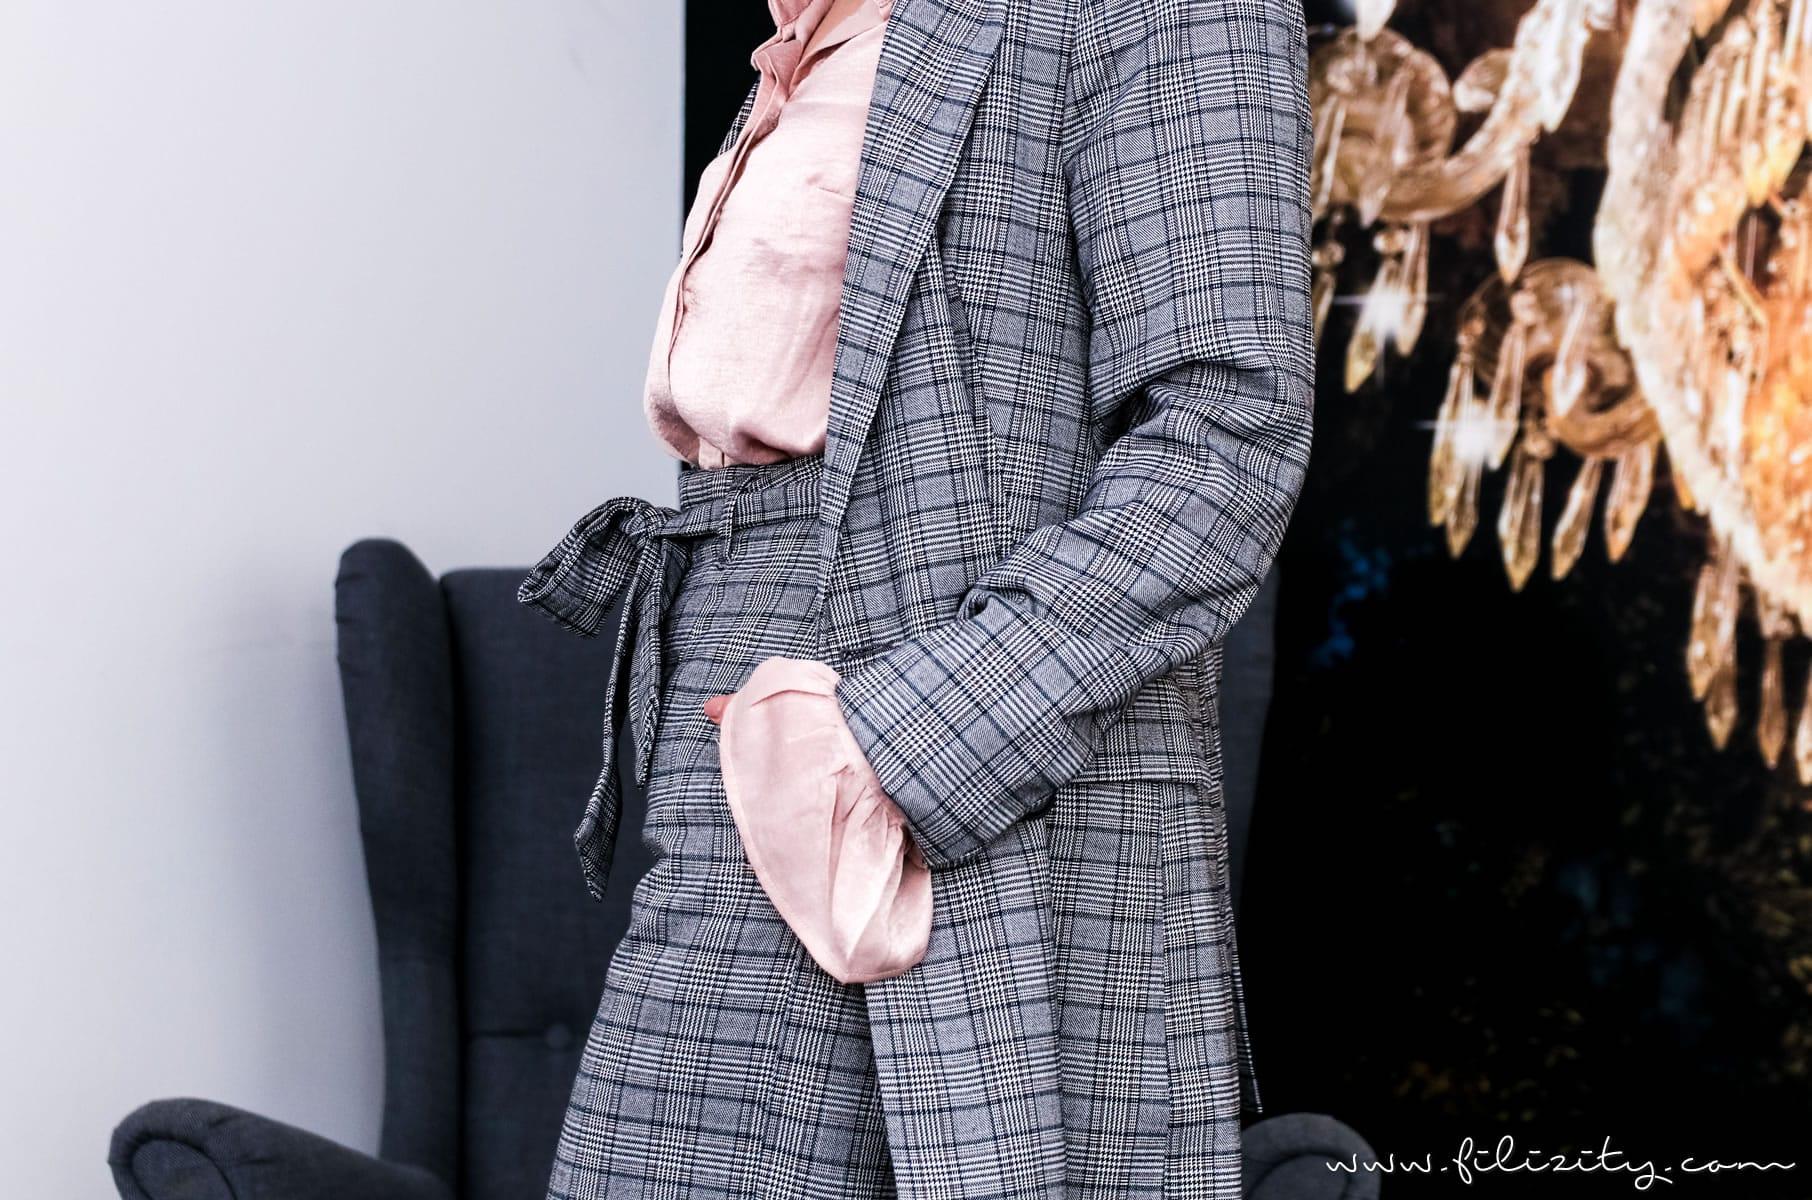 Herbst-Outfit: Glencheck Hosenanzug und Satin-Bluse mit Volant   Filizity.com   Fashion-Blog aus dem Rheinland #trends #hw2017 #glencheck